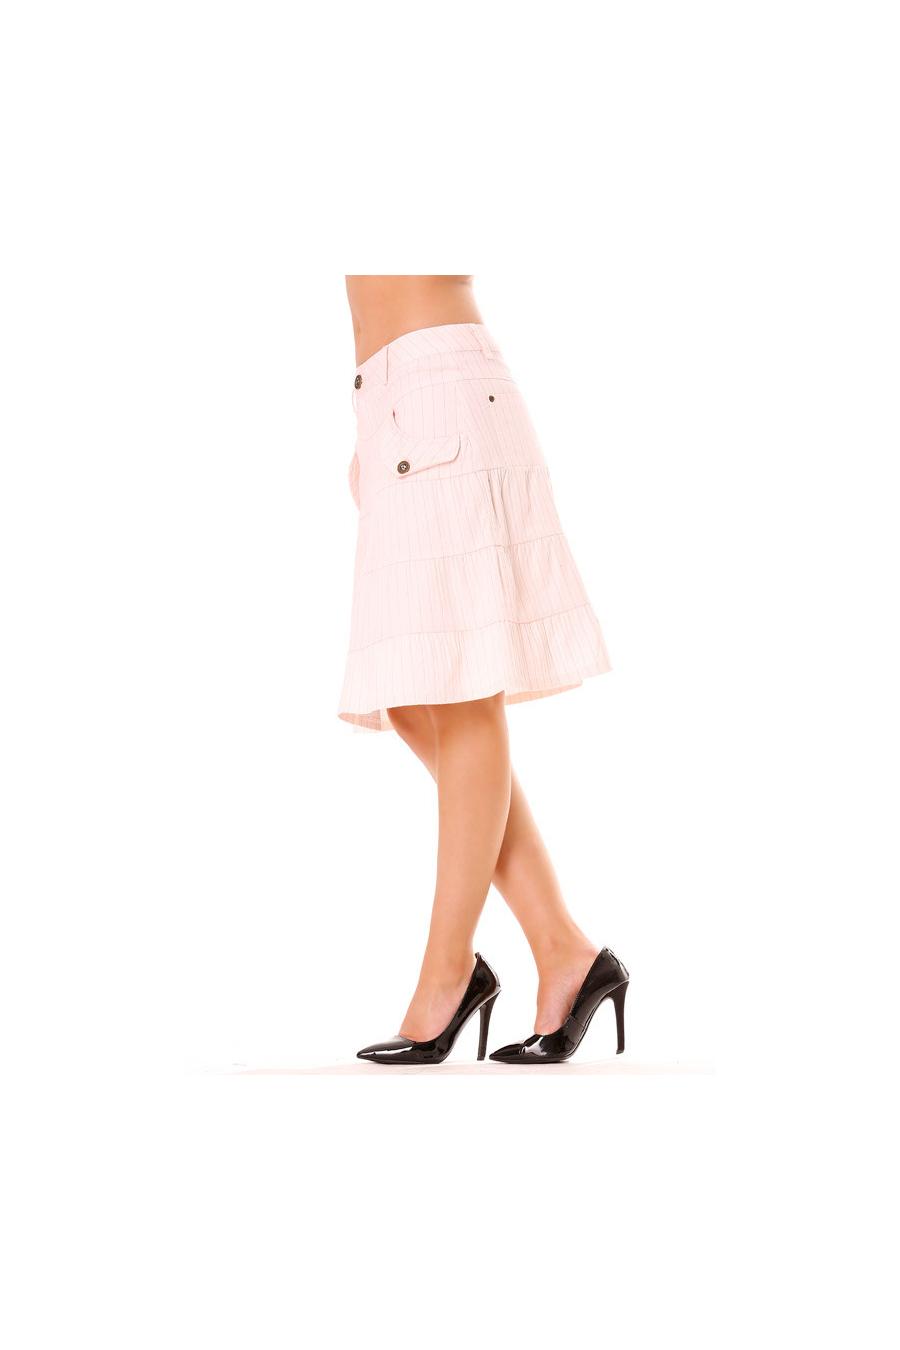 Wit gestreepte mid-knie wijd uitlopende rok met steekzakken. Vrouwenkleding